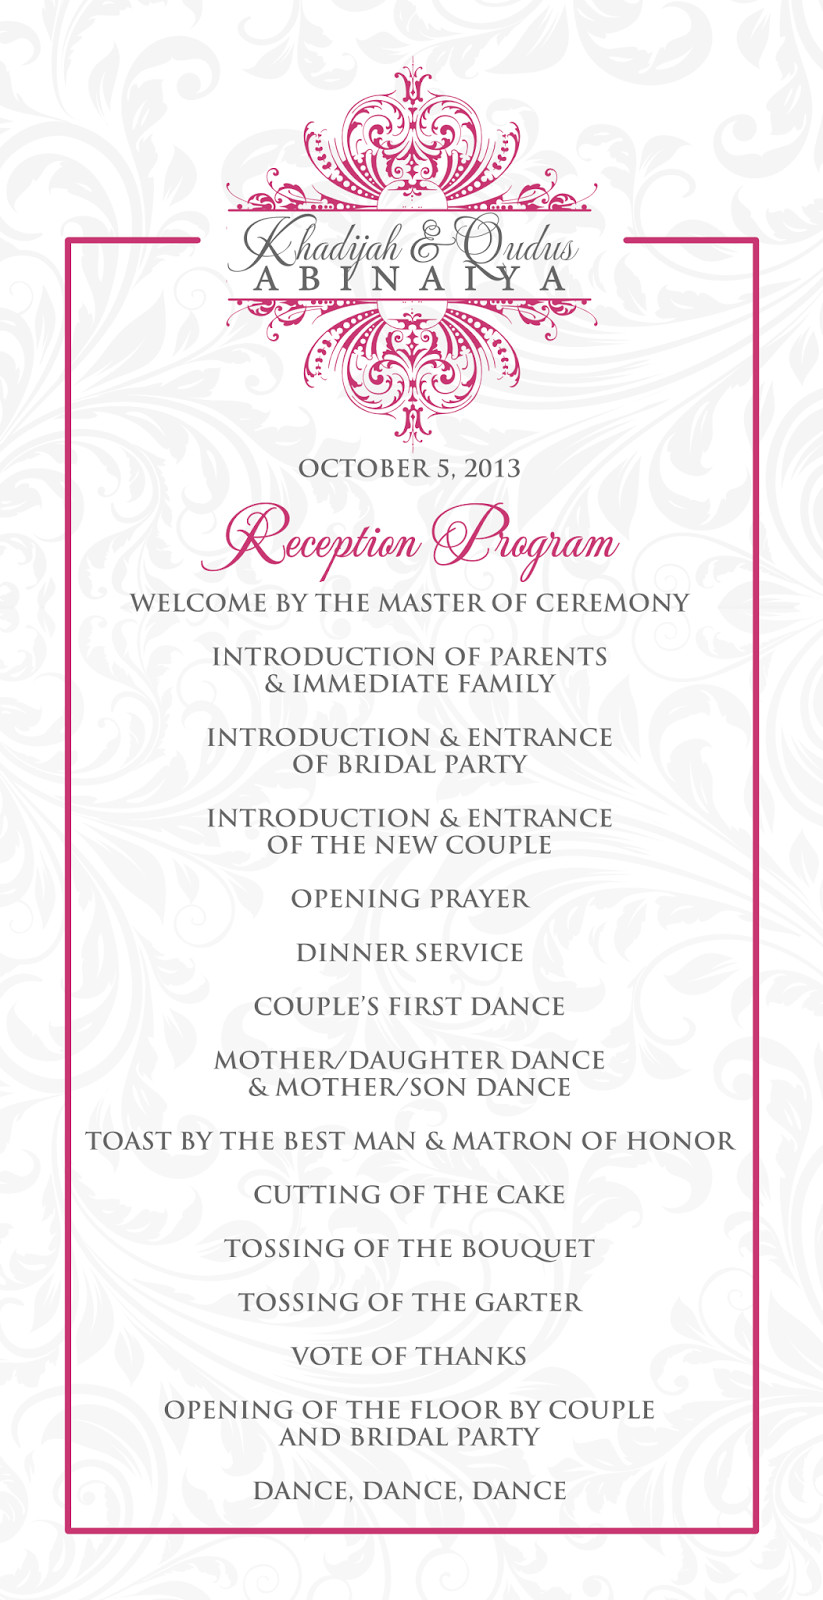 Wedding Reception Program Template Signatures by Sarah Wedding Stationery for Khadijah